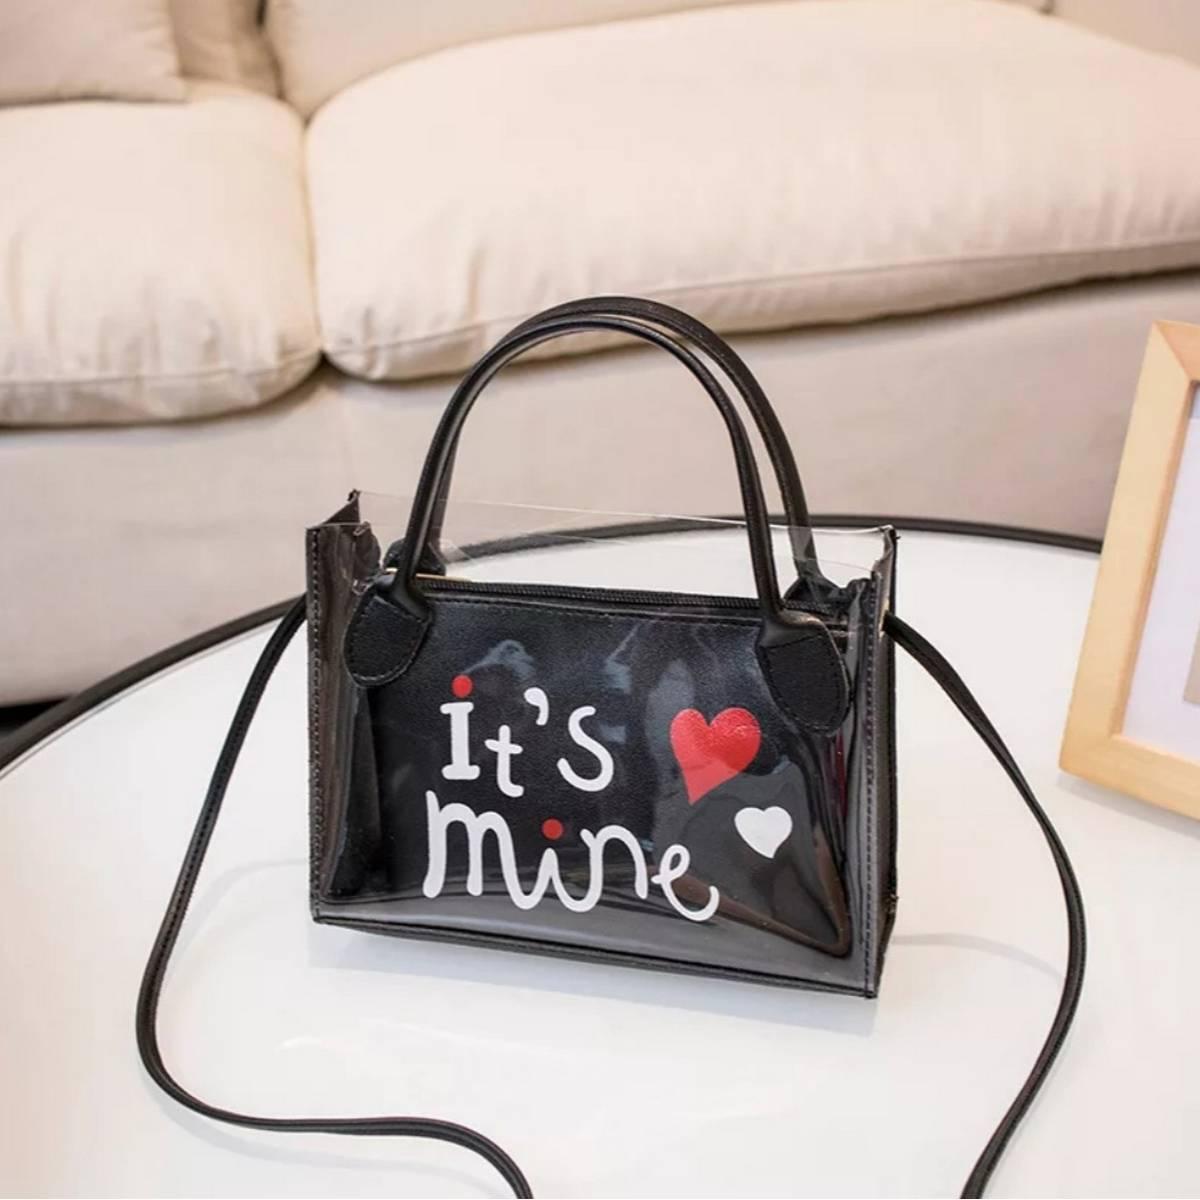 Women's Bag New Fashion Printed Transparent Tote Bag Shoulder Crossbody Portable Small Square Bag